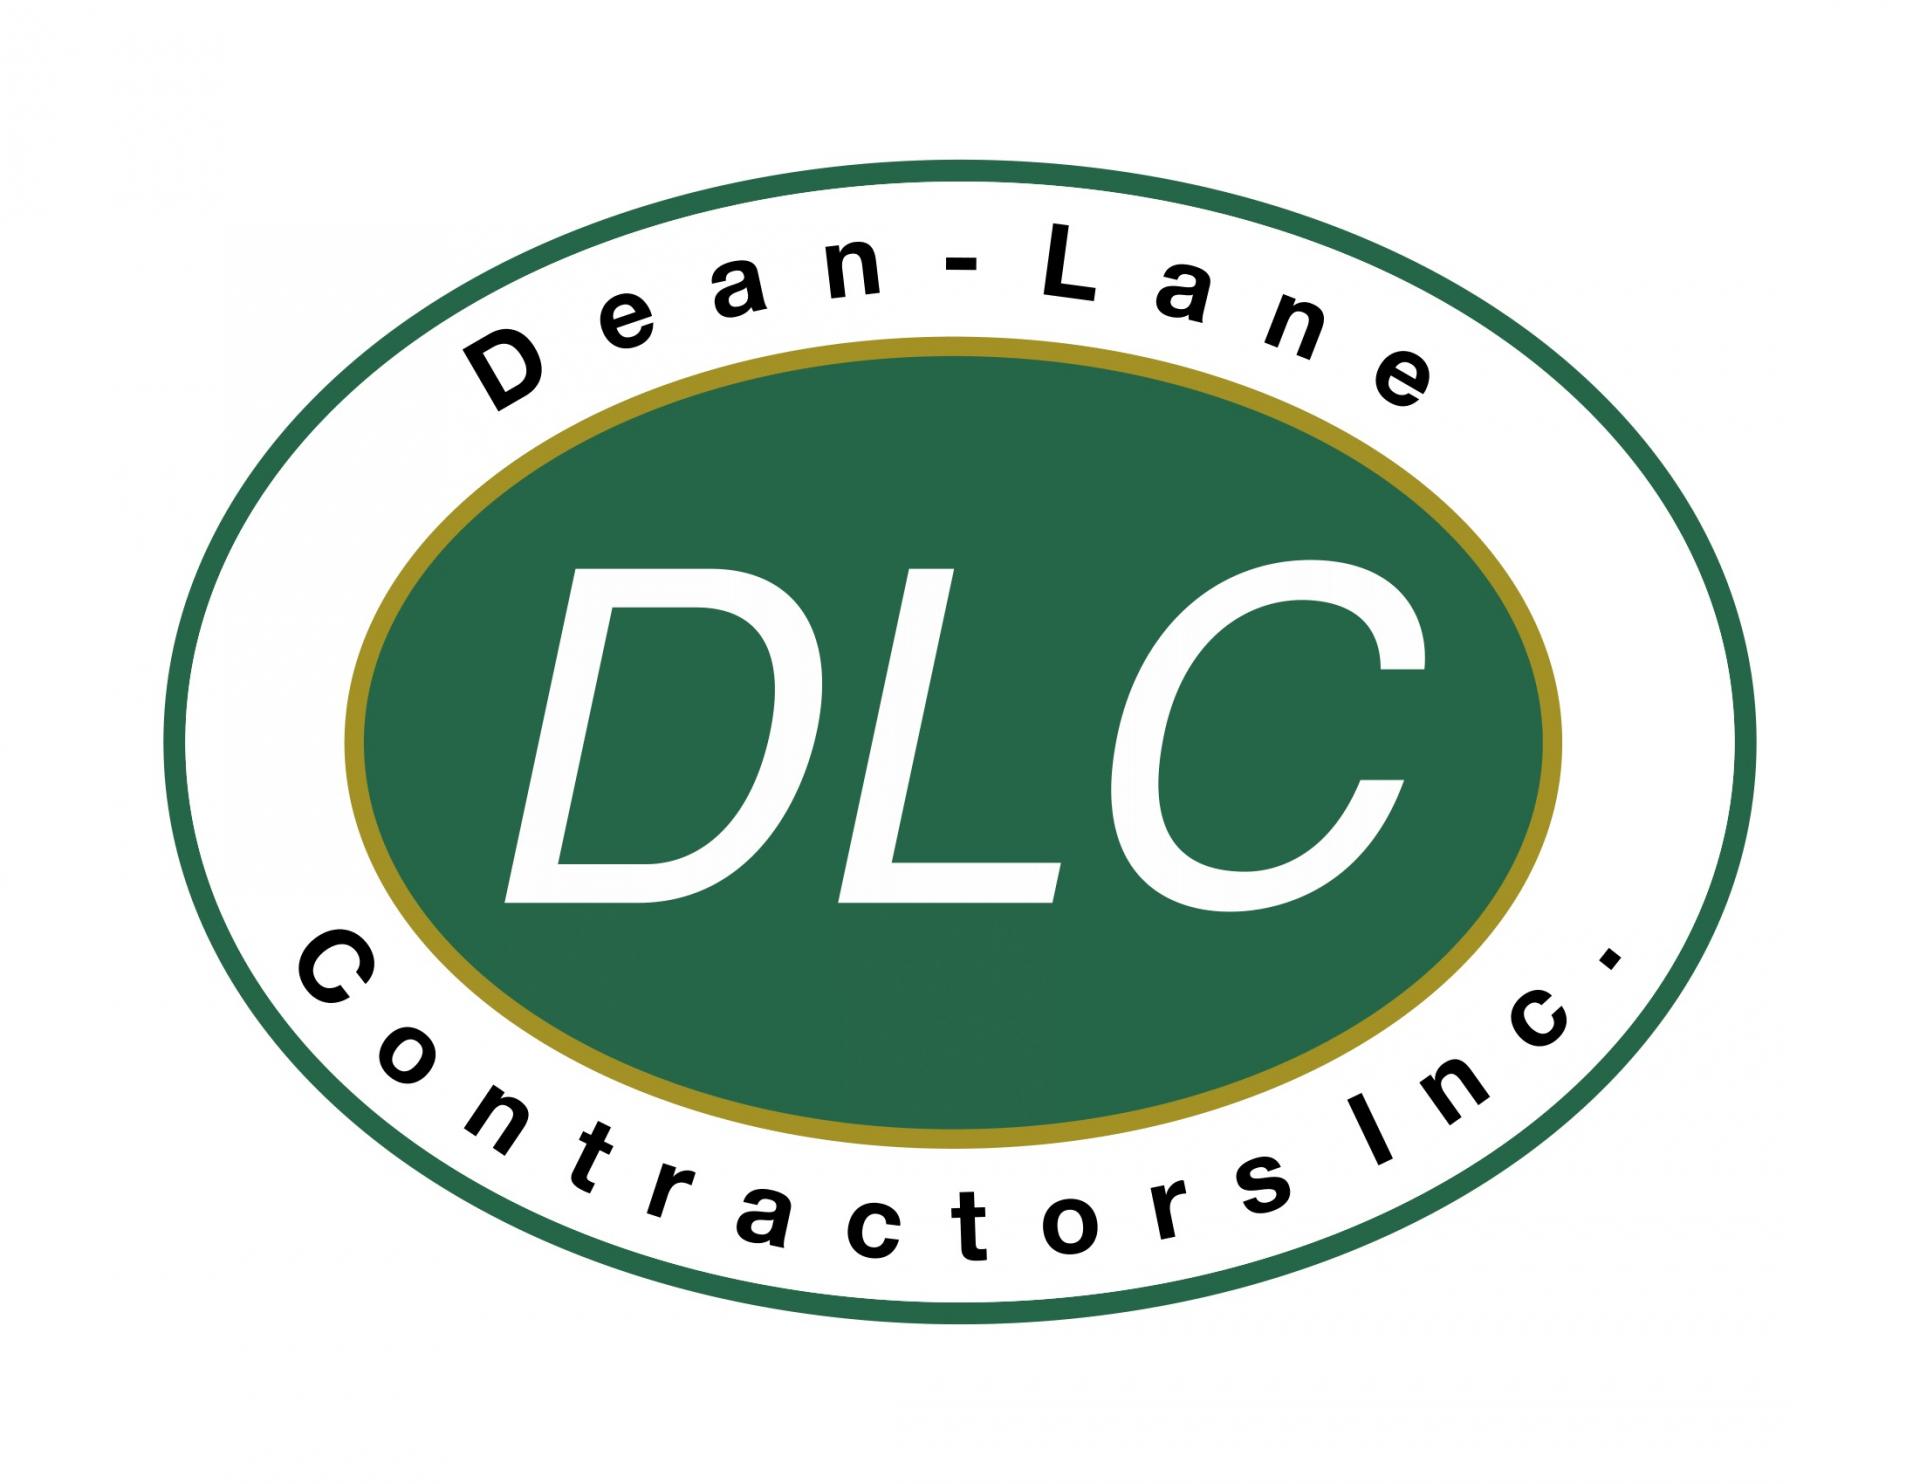 Dean Lane Contractors